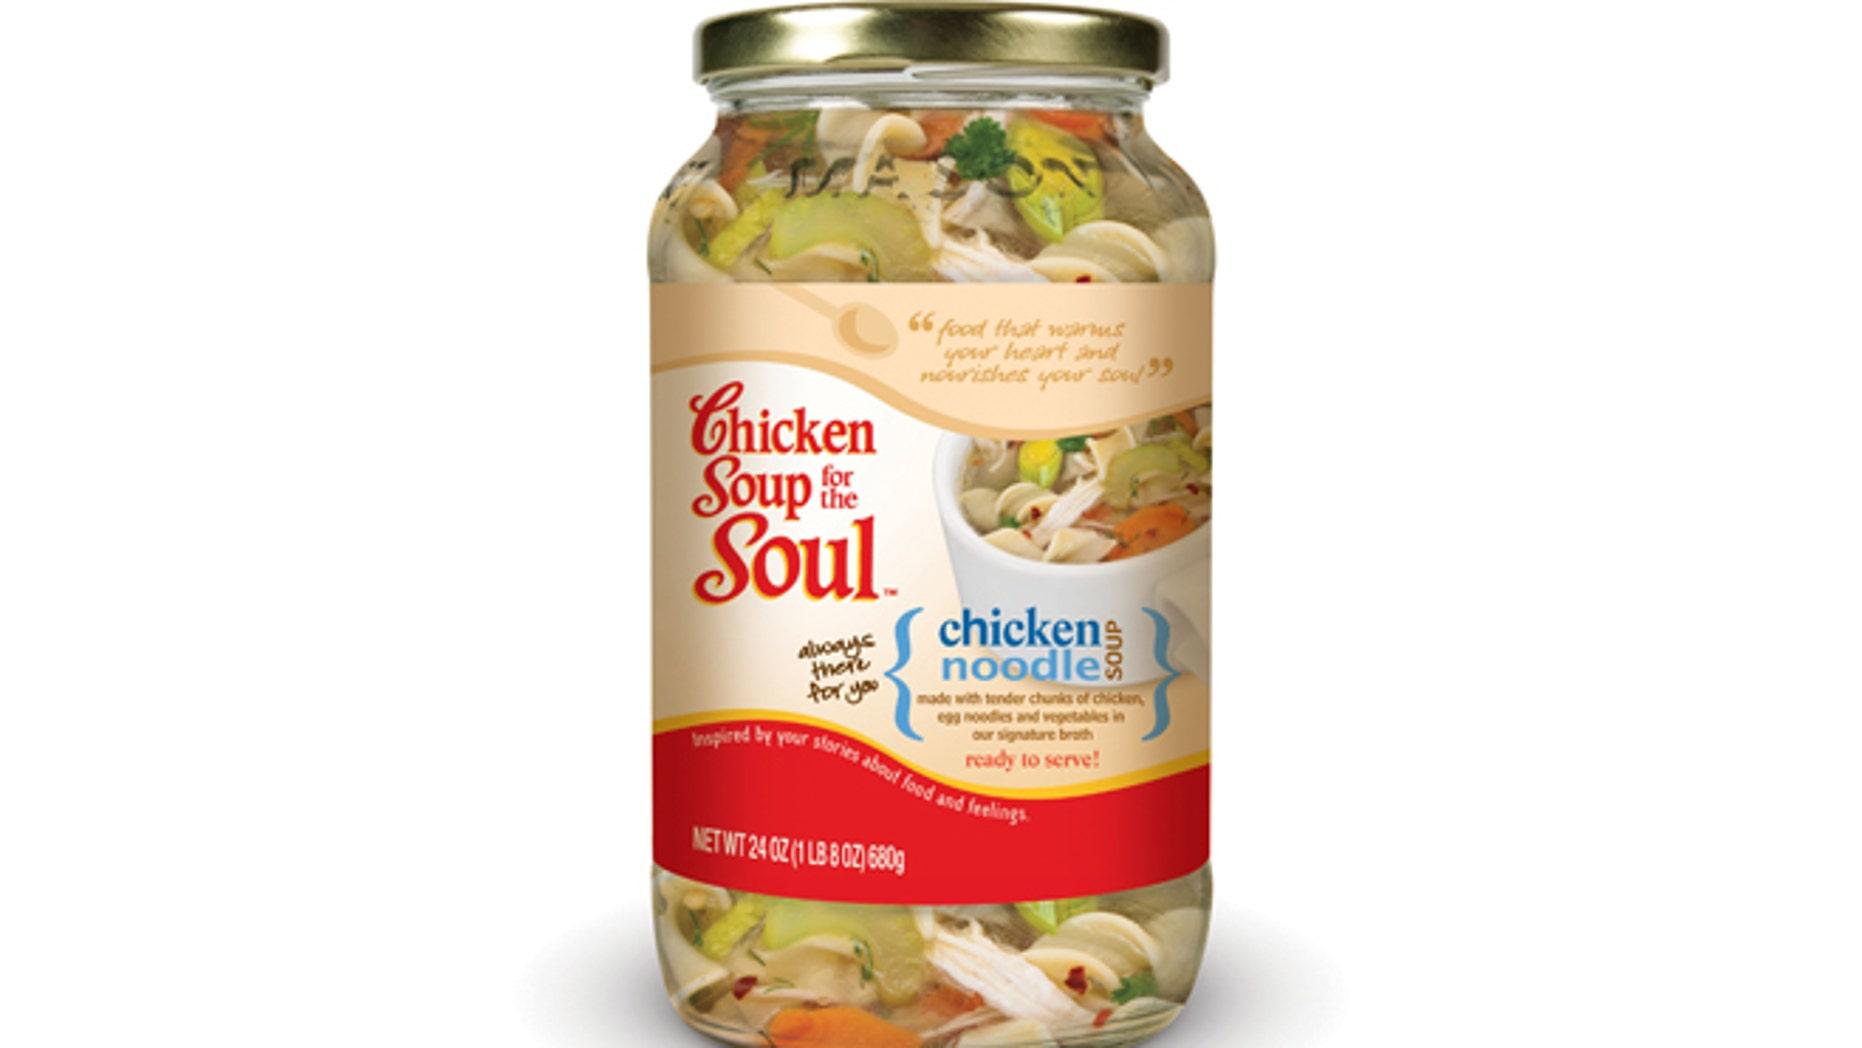 Chicken Noodle Soup.  (PRNewsFoto/Chicken Soup for the Soul Foods LLC)